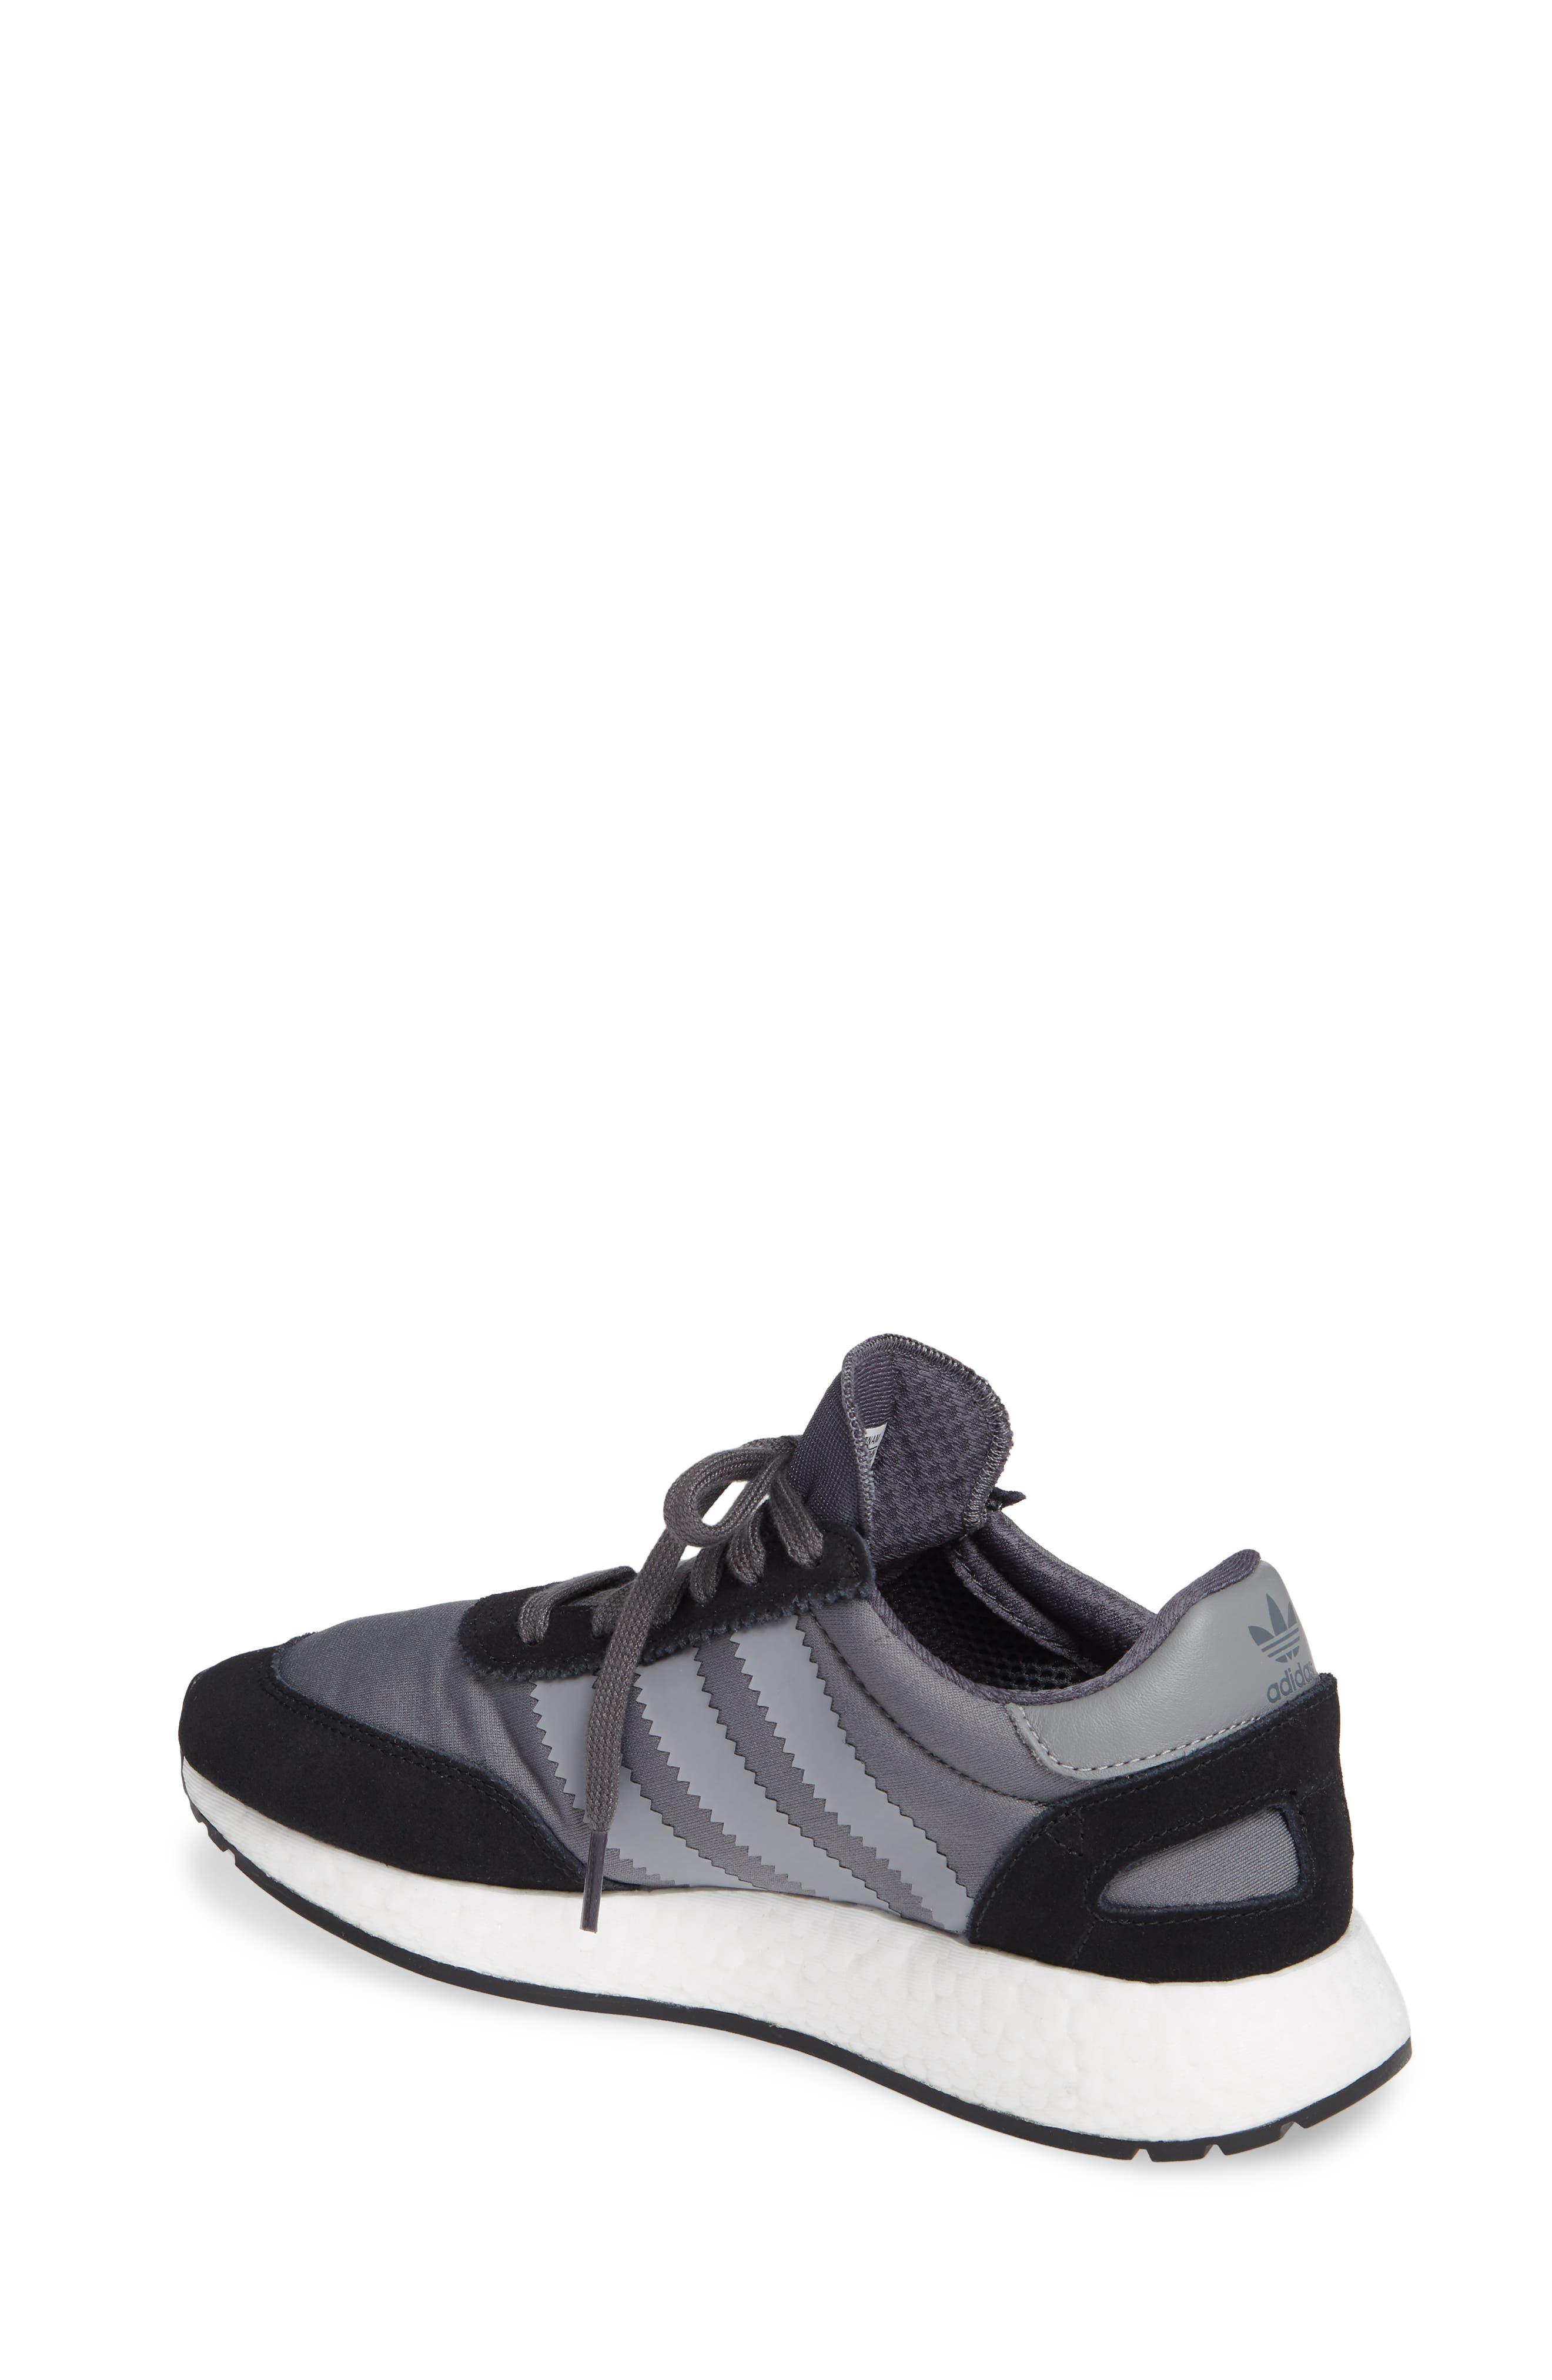 I-5923 Sneaker,                             Alternate thumbnail 2, color,                             BLACK/ GREY THREE/ GREY FIVE